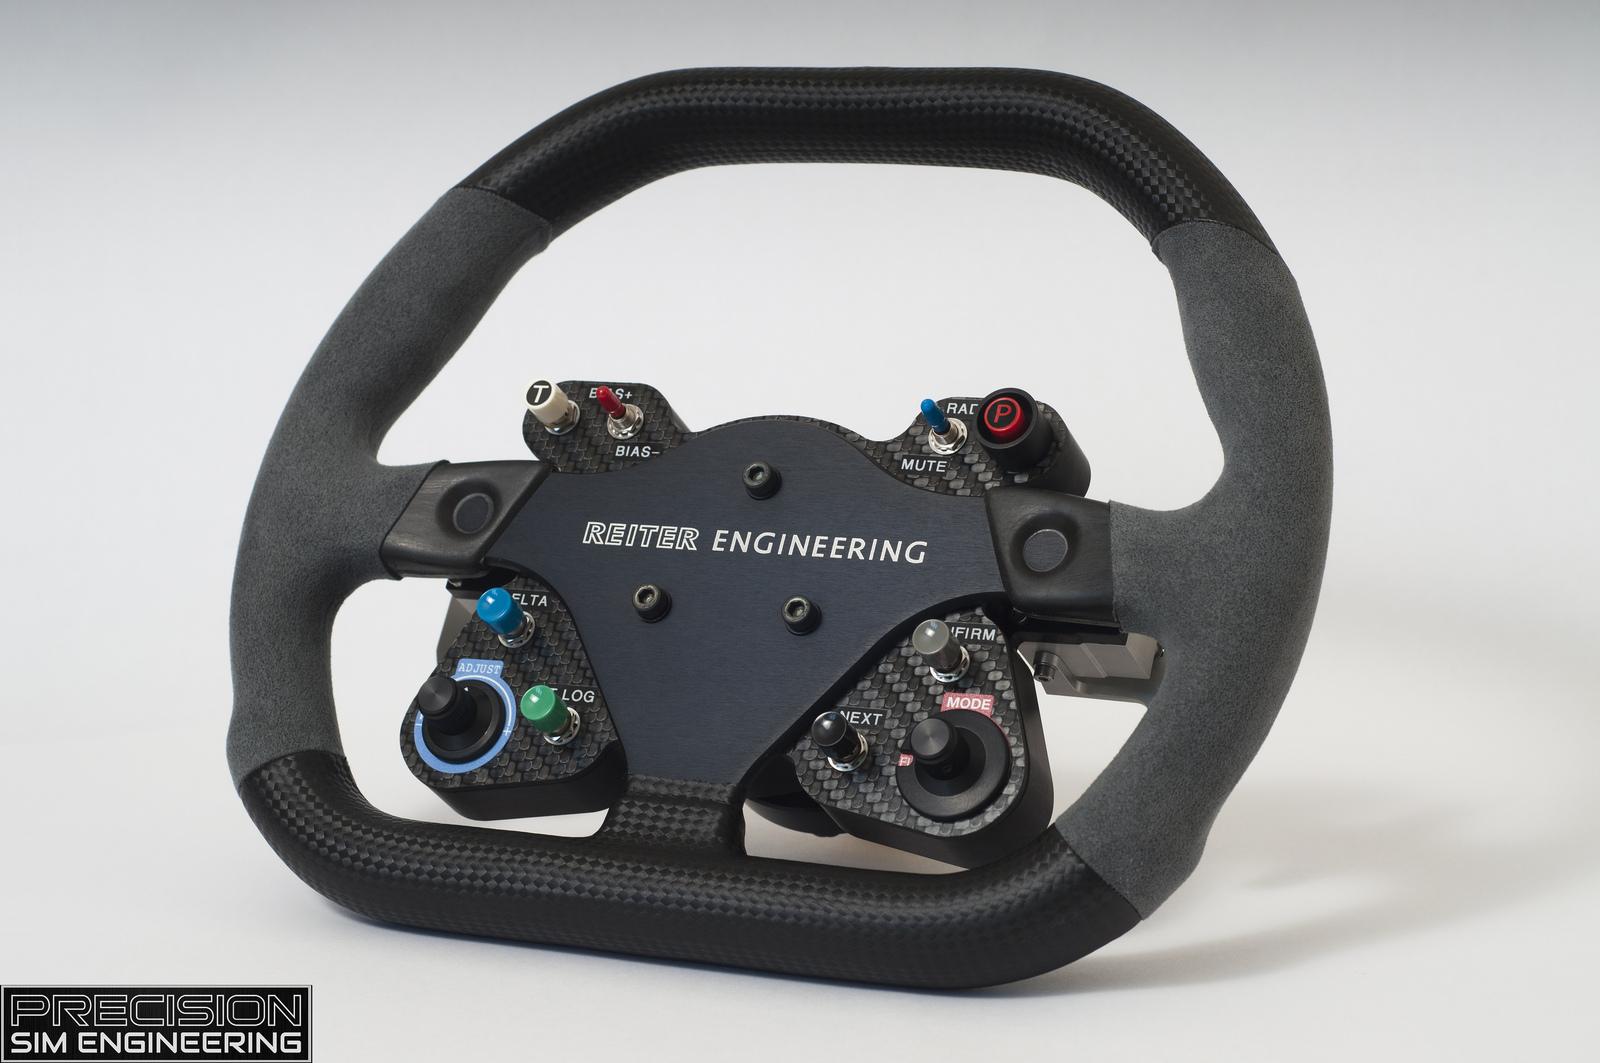 precision sim engineering unveils gt wheels. Black Bedroom Furniture Sets. Home Design Ideas